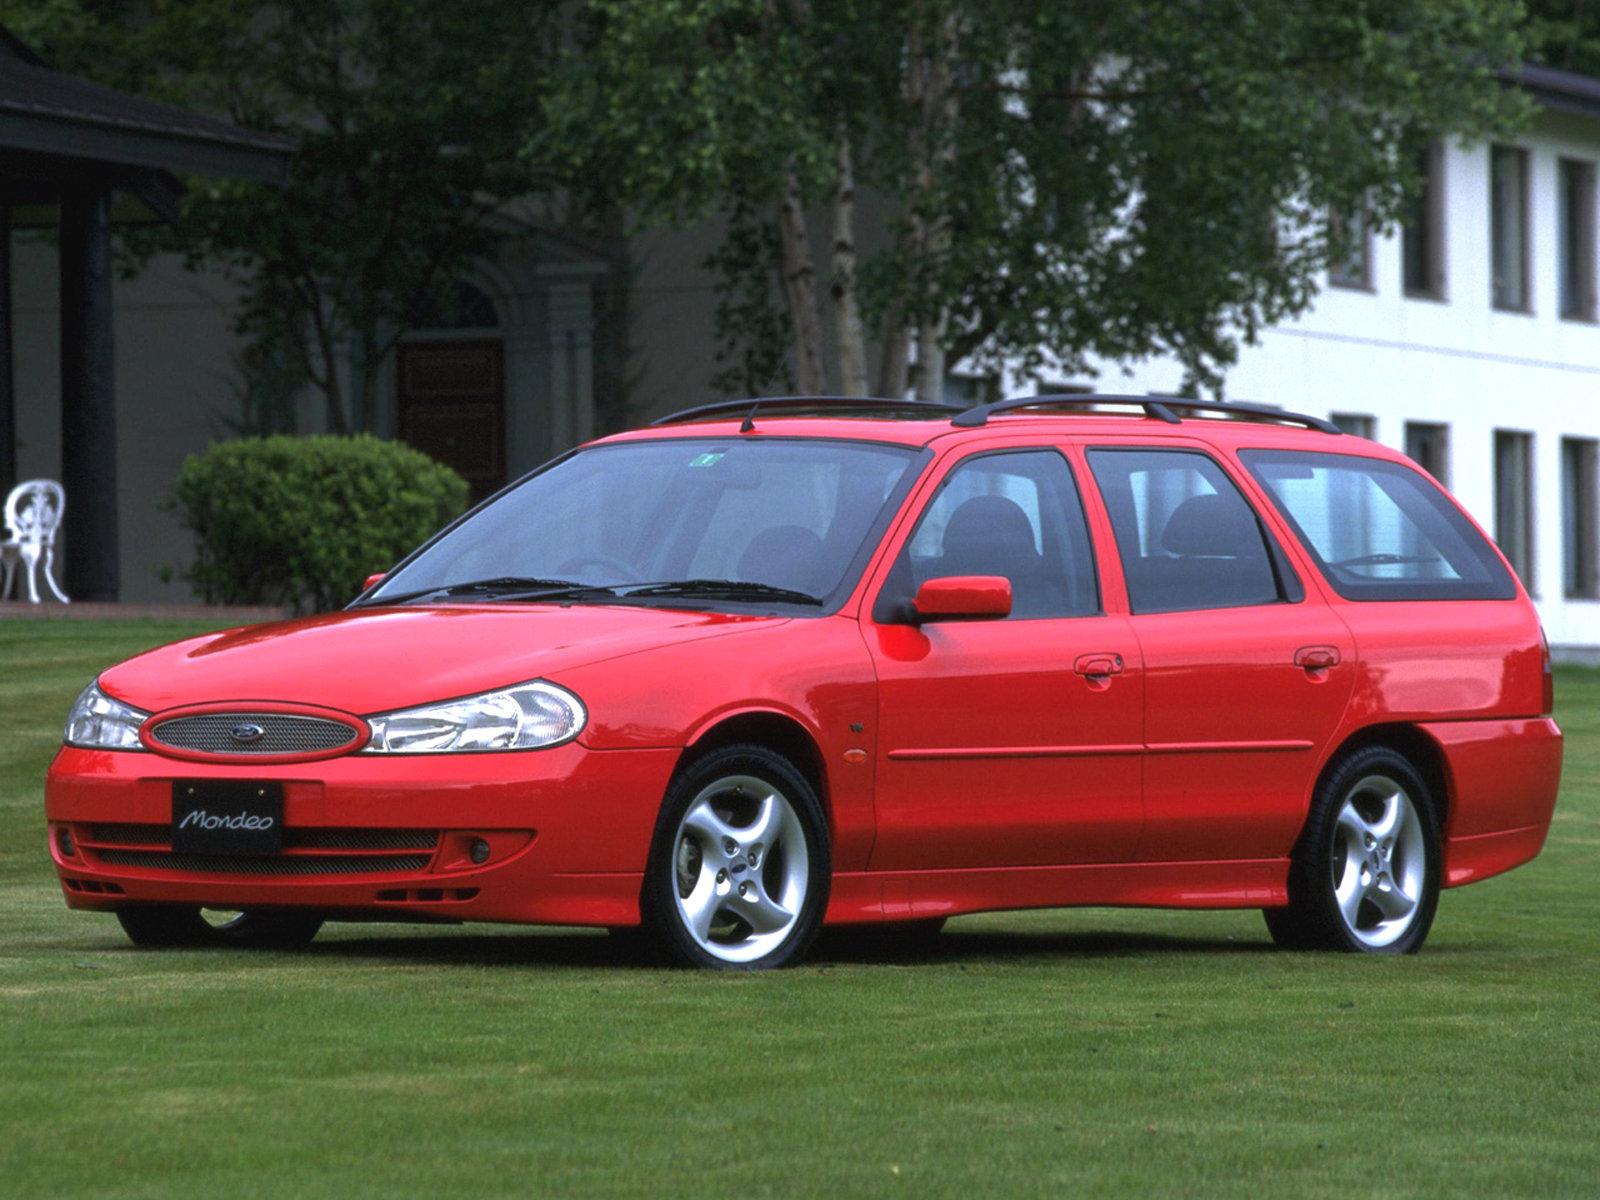 Ford Mondeo 1, 1993-2000 - обзор, отзывы, характеристики ...